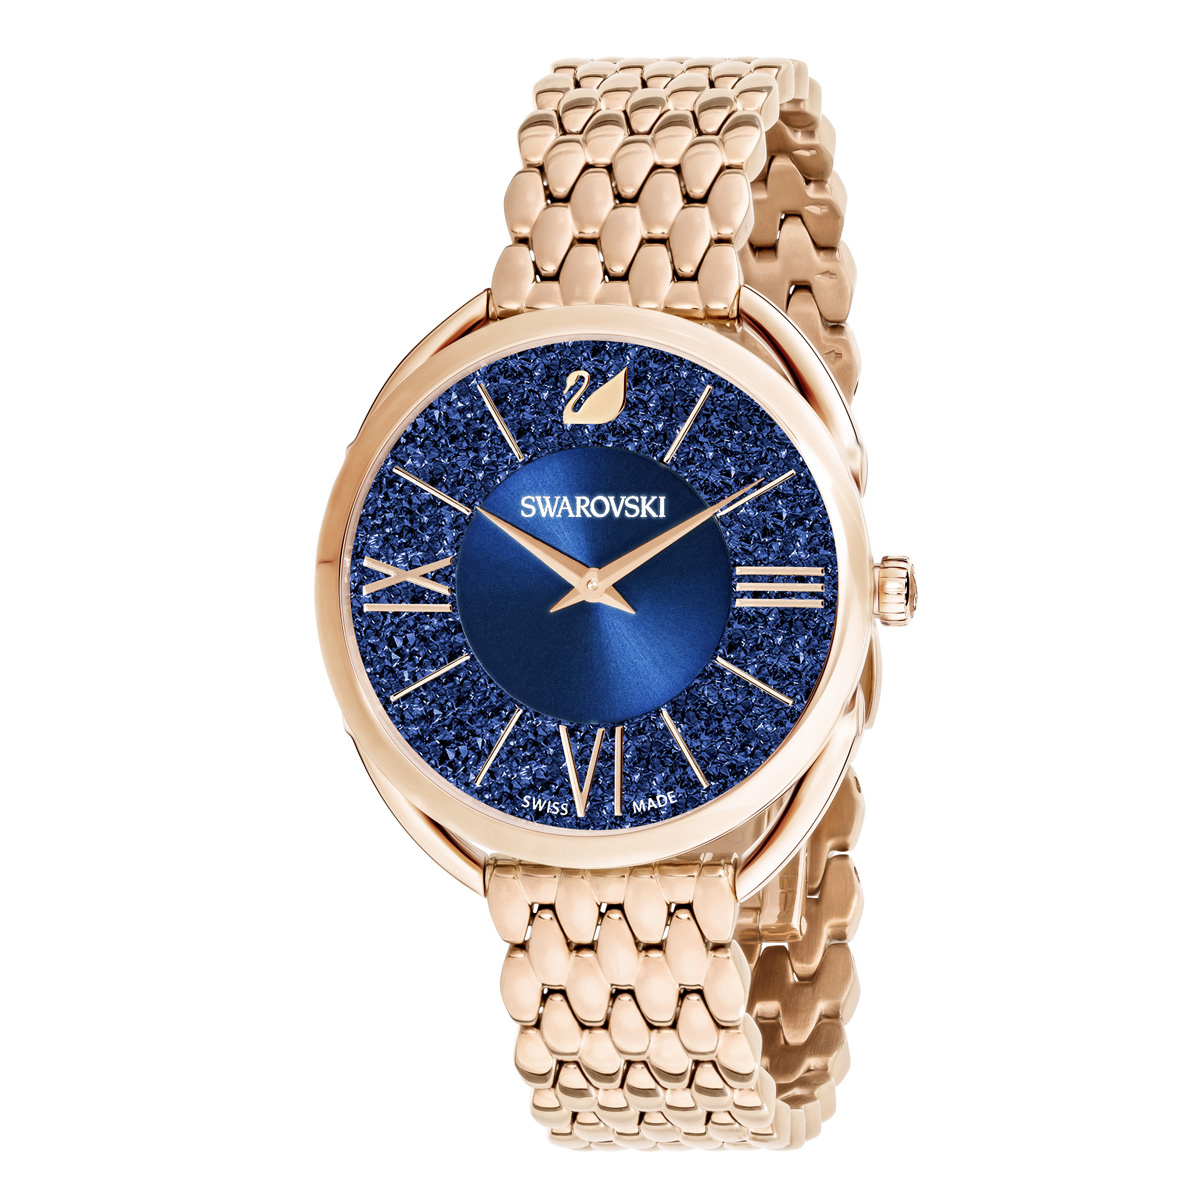 Swarovski Crystalline Glam Watch, Metal Bracelet, Blue, Rose Gold